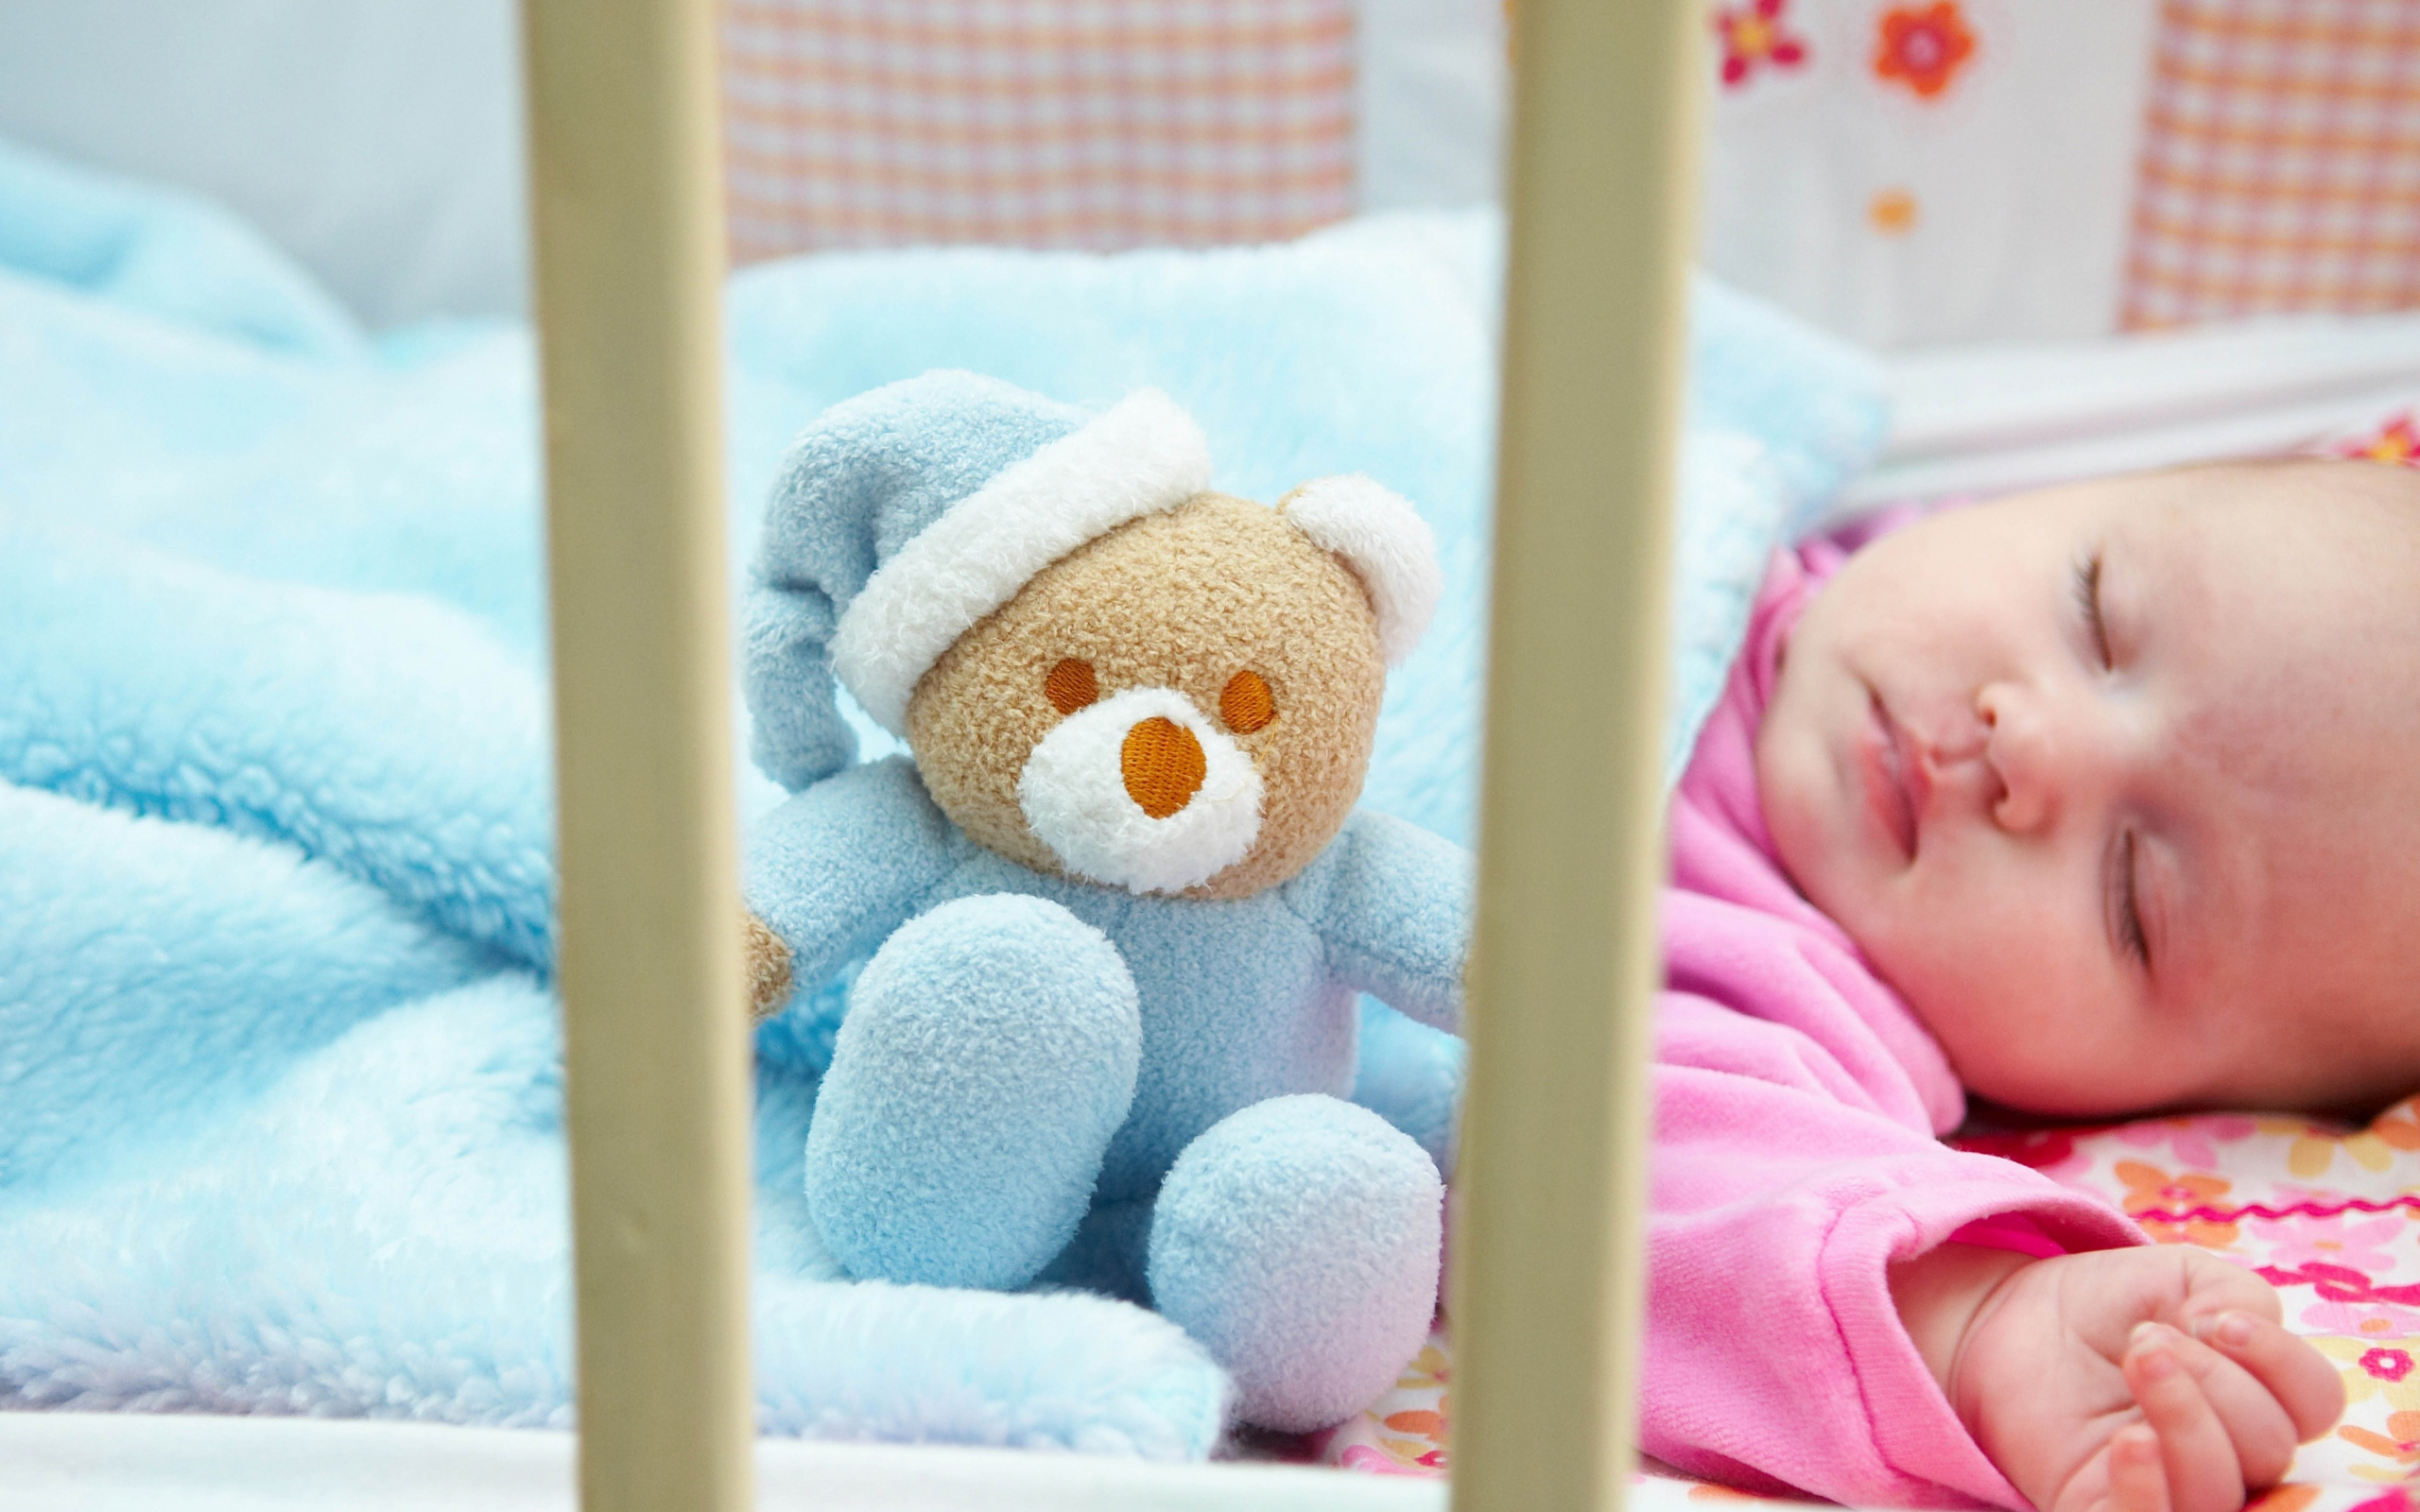 baby_sleep_teddy_bear_toy_riding_80481_2560x1600